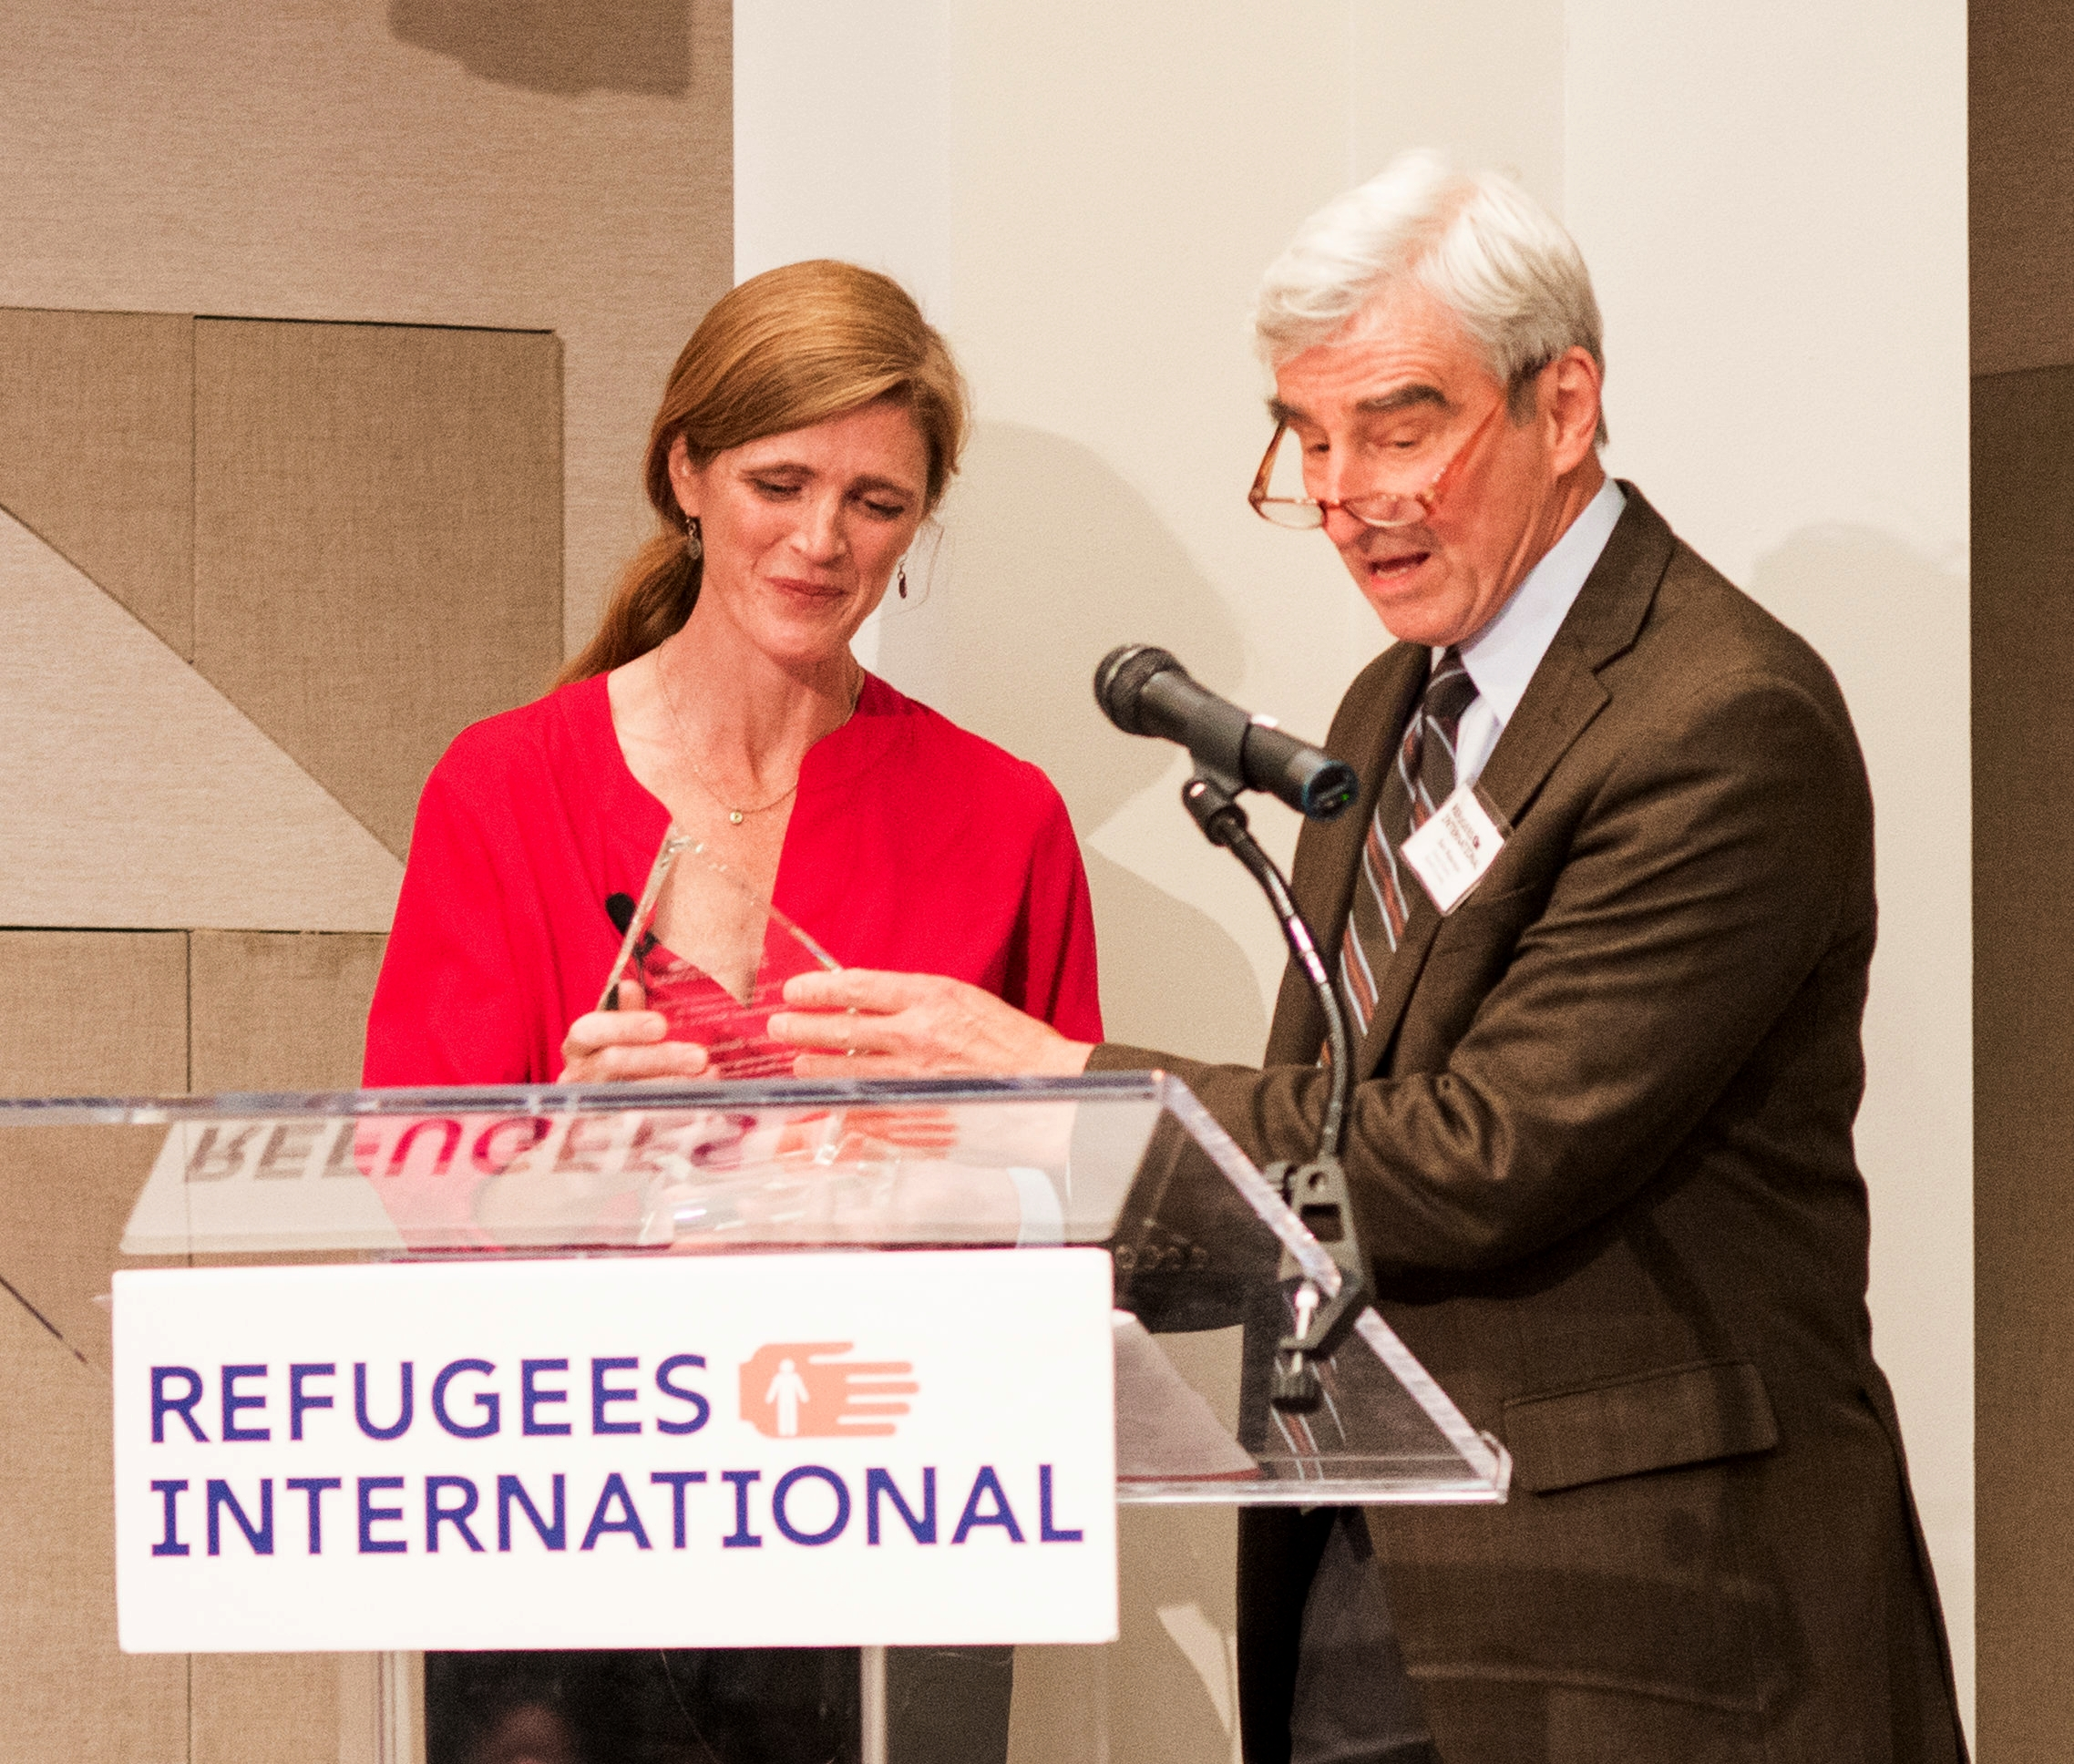 Ambassador Samantha Power receives the 2017 Refugees International Exceptional Service Award from Board Member Emeritus Sam Waterston.